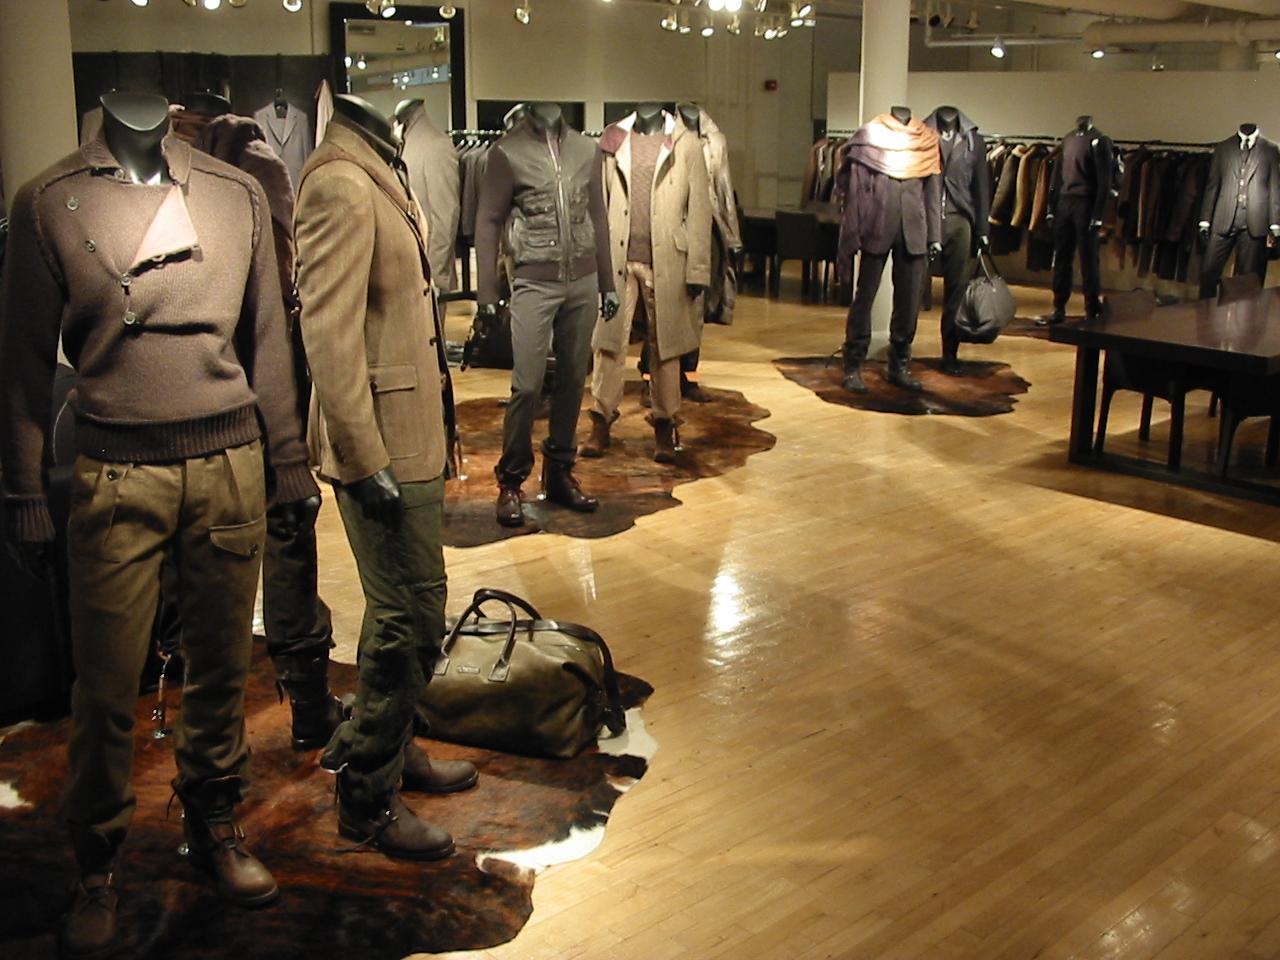 stores_18.JPG